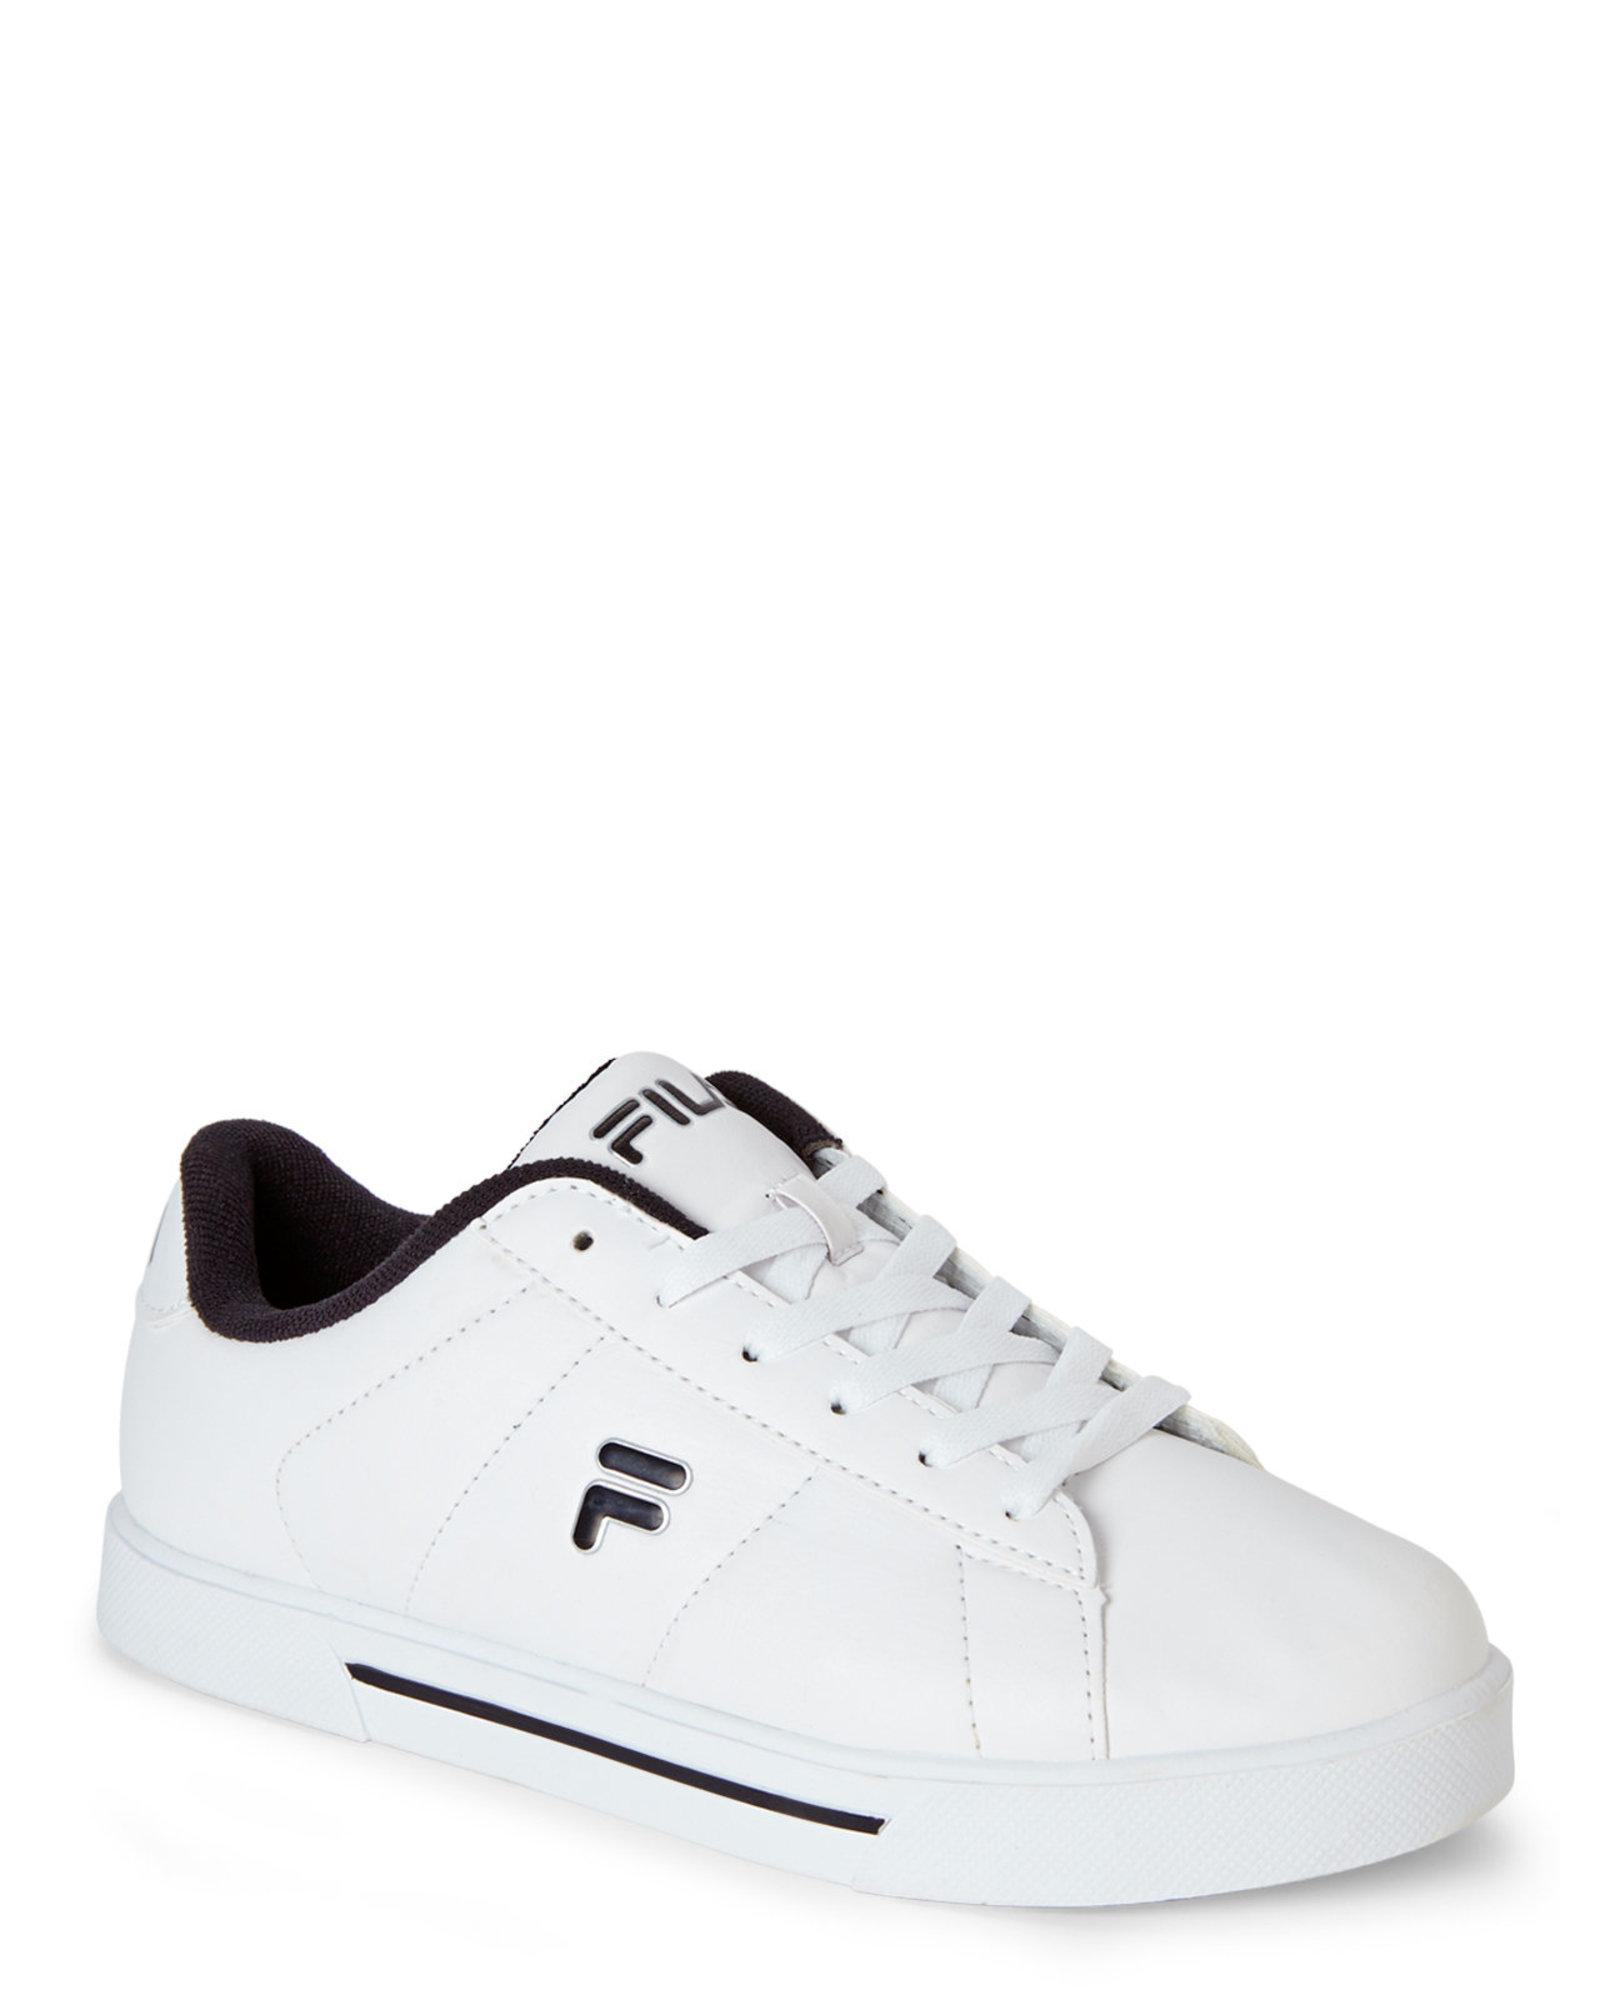 27caad6b9f9 Fila - White   Black Benefactor Sneakers - Lyst